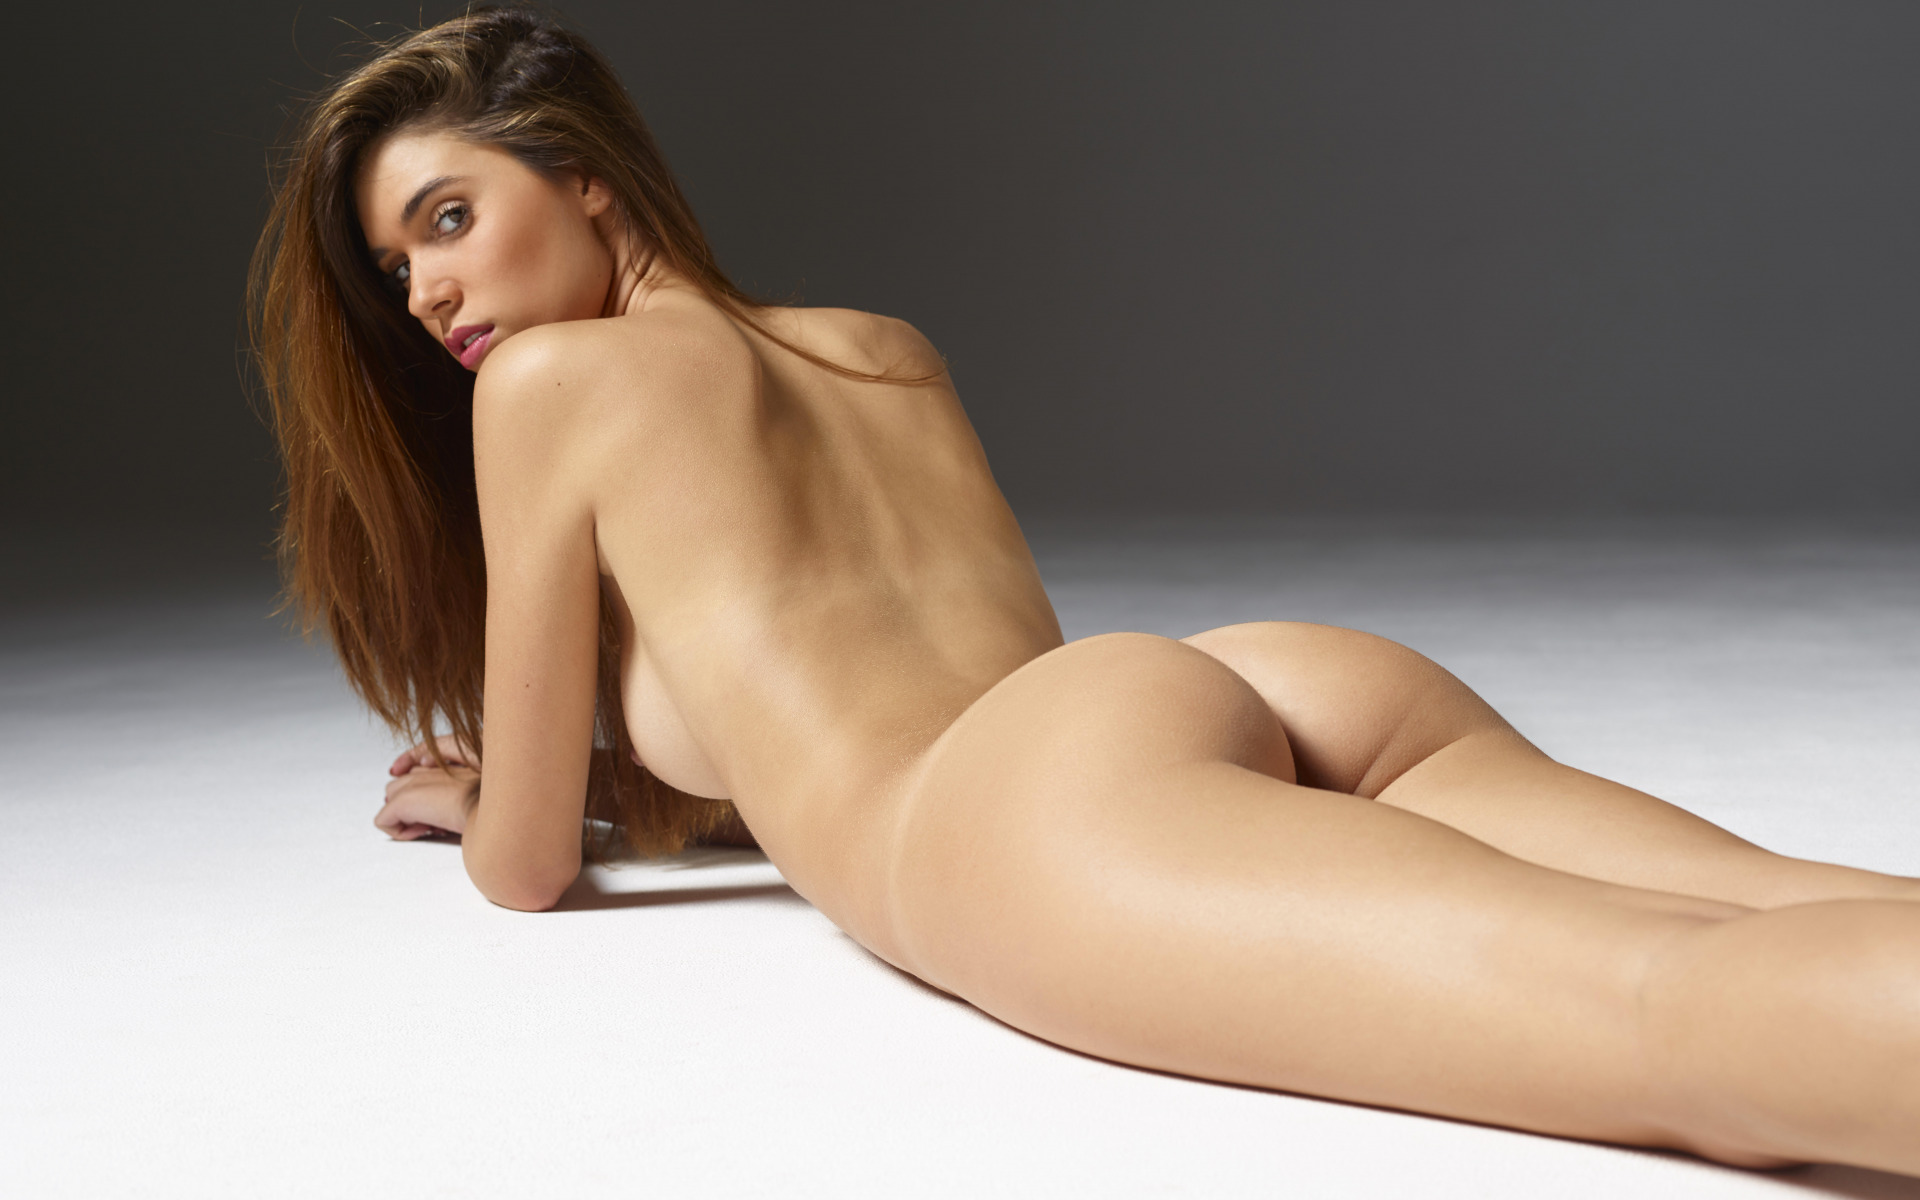 hair-models-naked-videos